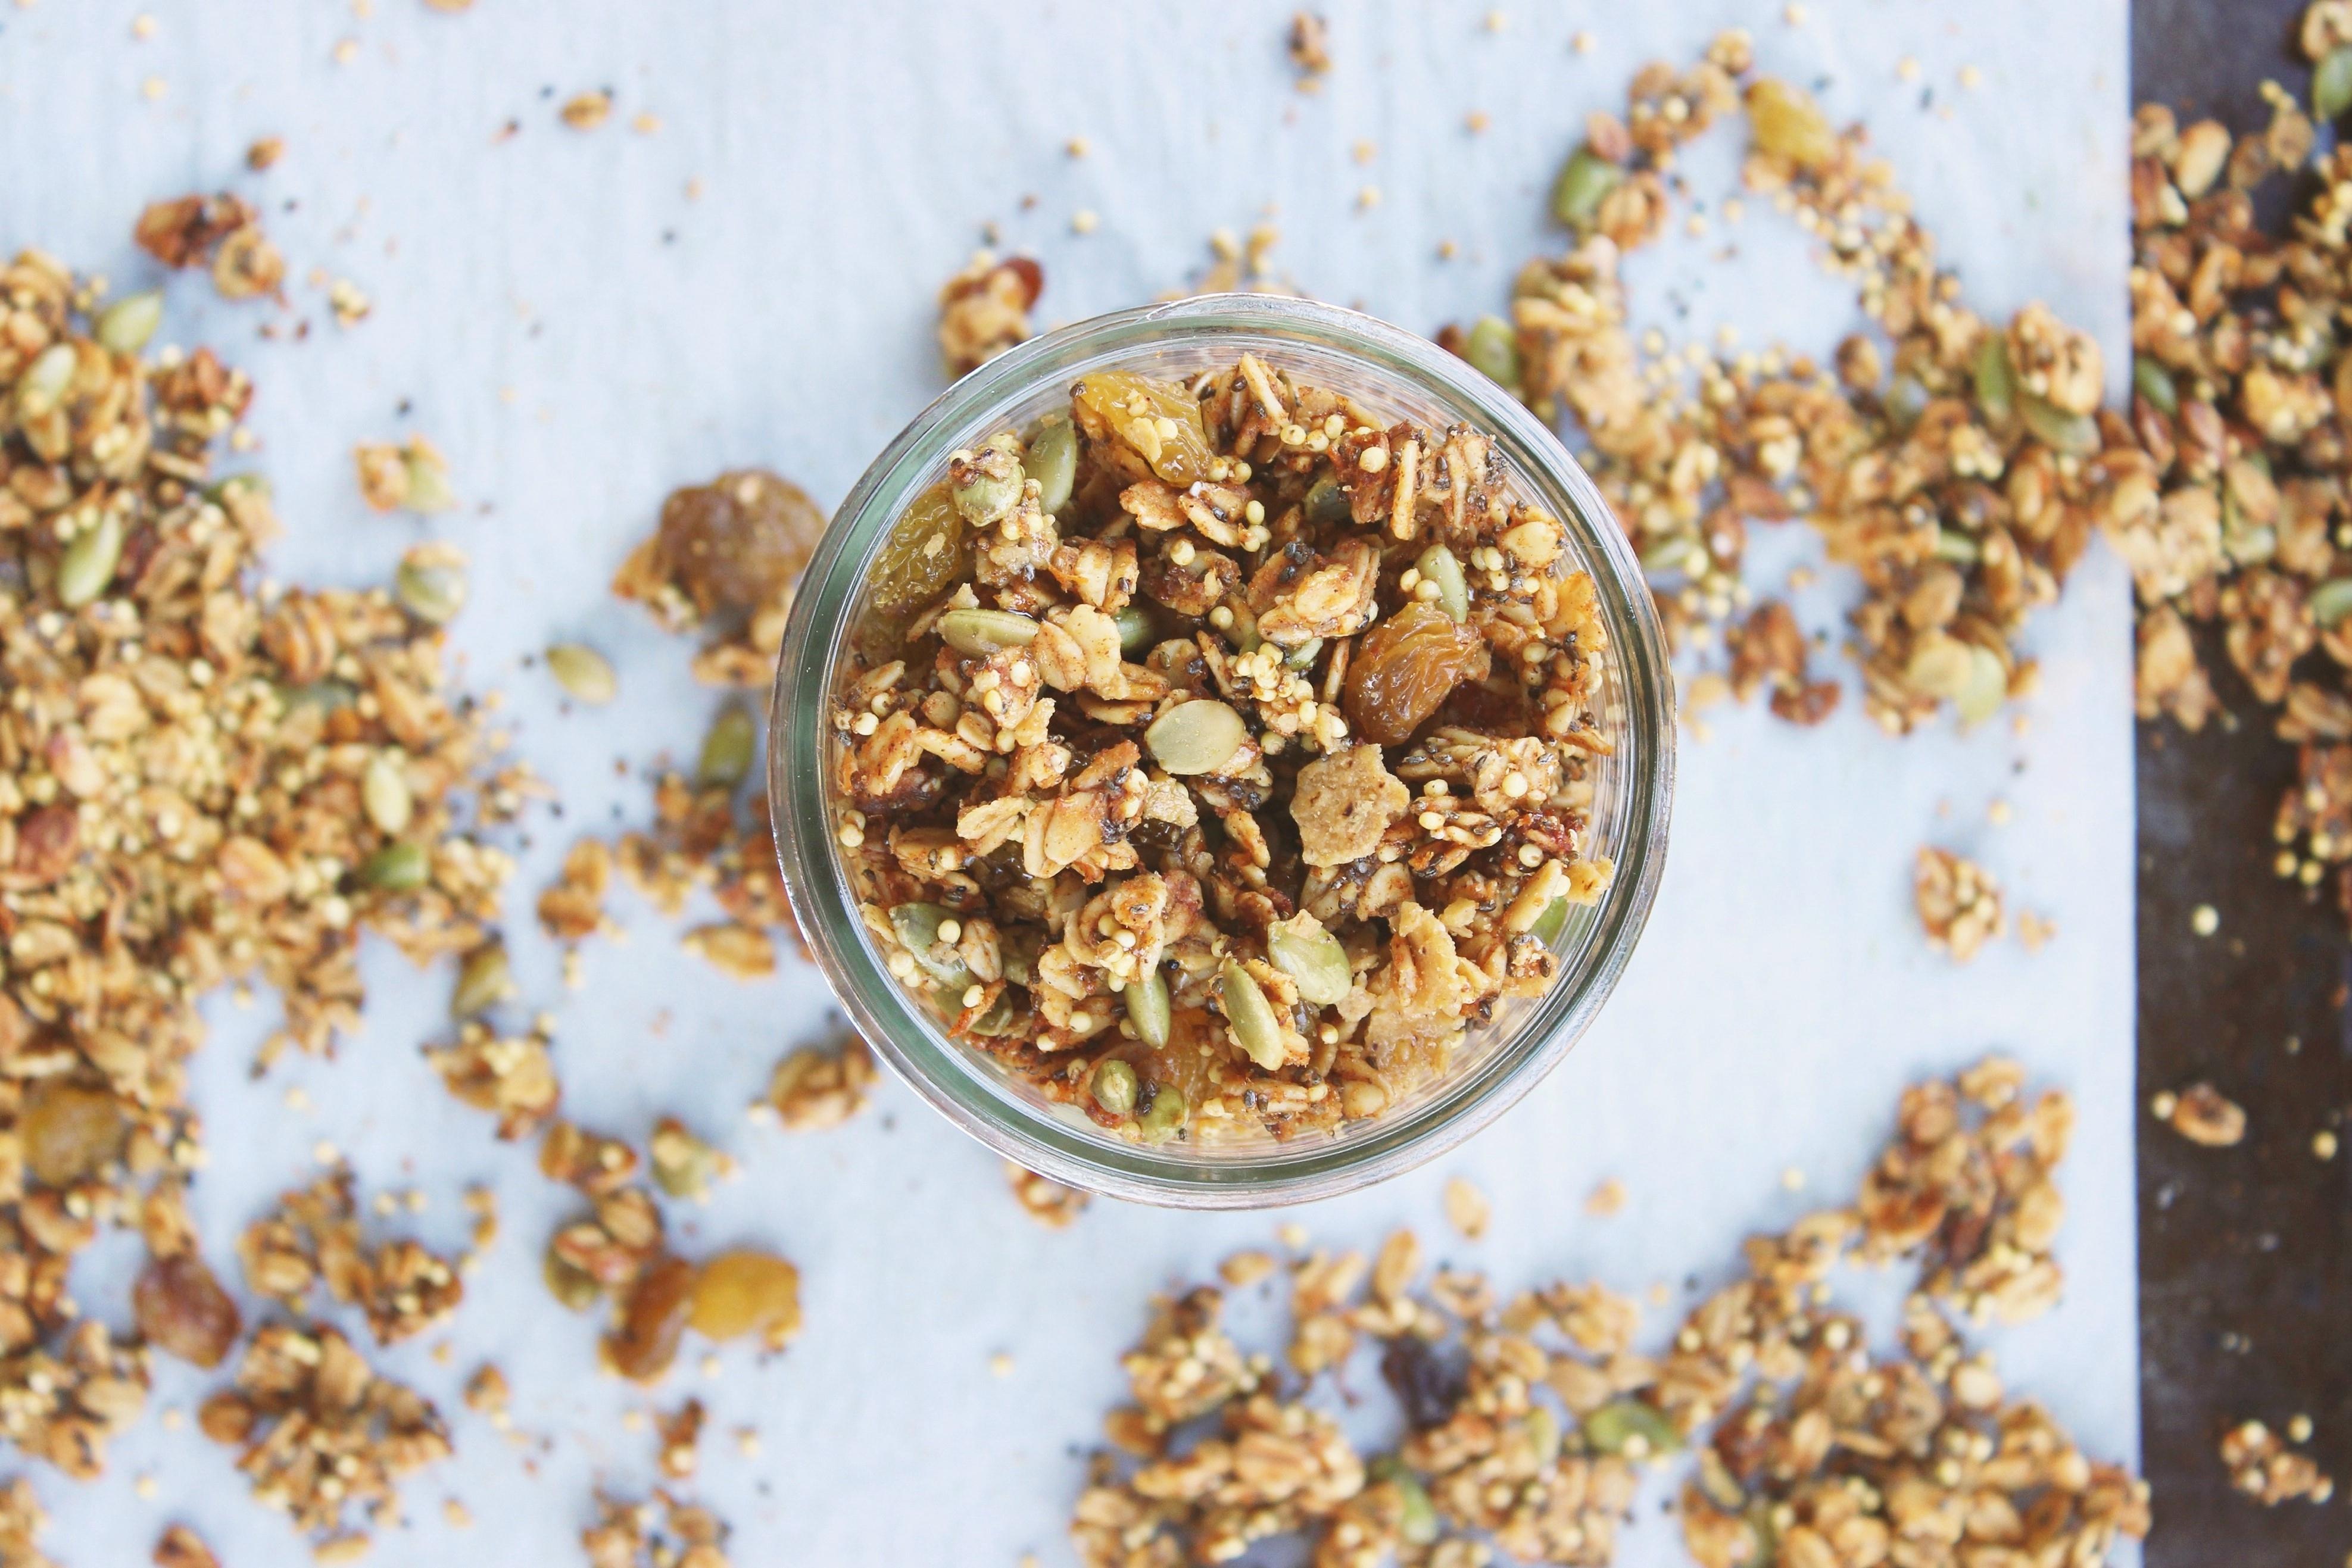 millet-cardamom-sweet-potato-granola-gluten-free-recipes